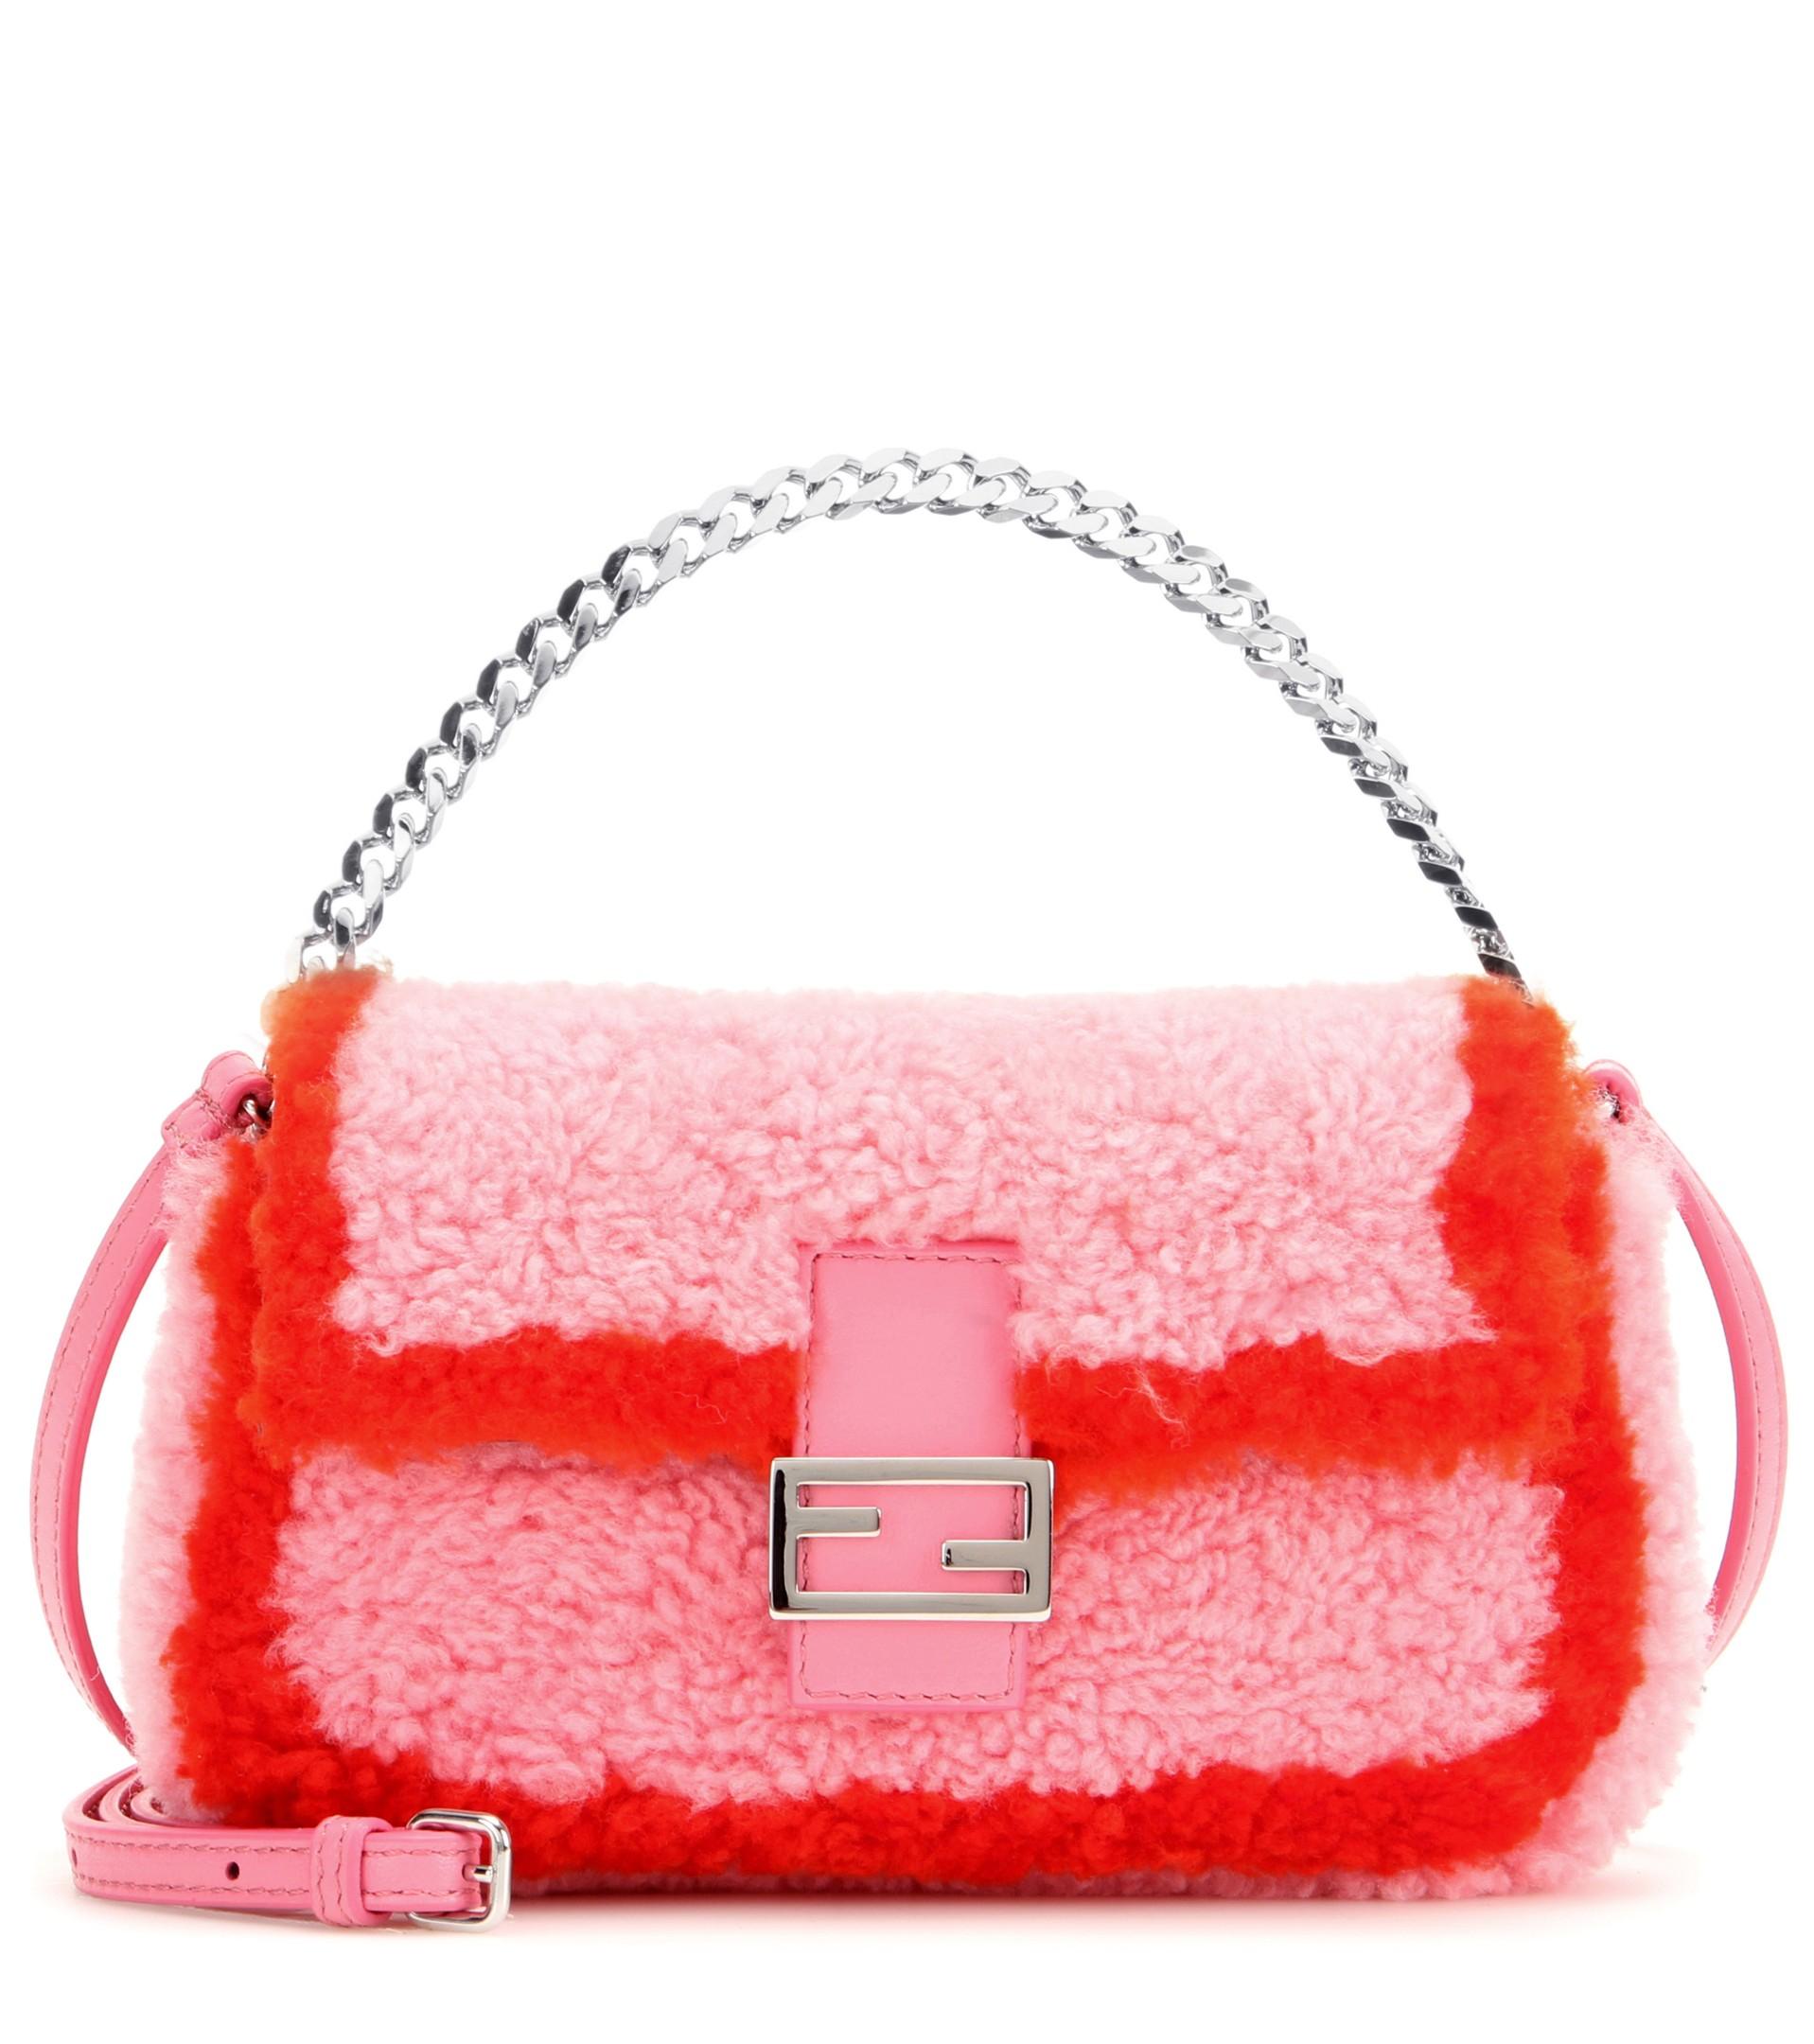 5f6201a1f8 ... resolution 600 900 previous next fendi micro peekaboo bag 2015 a8131  63fa4 australia lyst fendi micro baguette shearling shoulder bag in pink  a26a8 ...